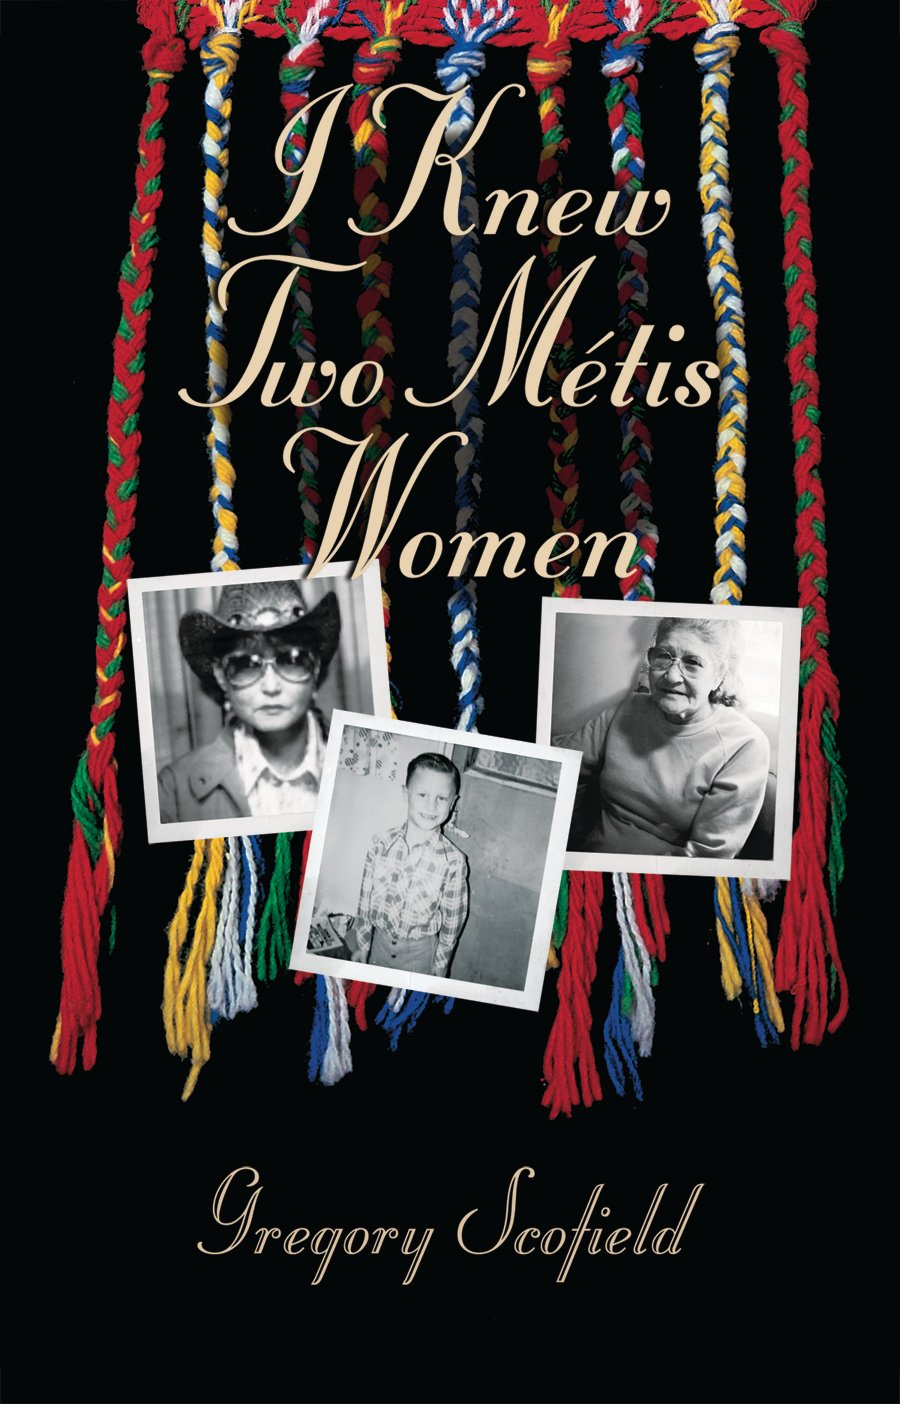 I Knew Two Metis Women